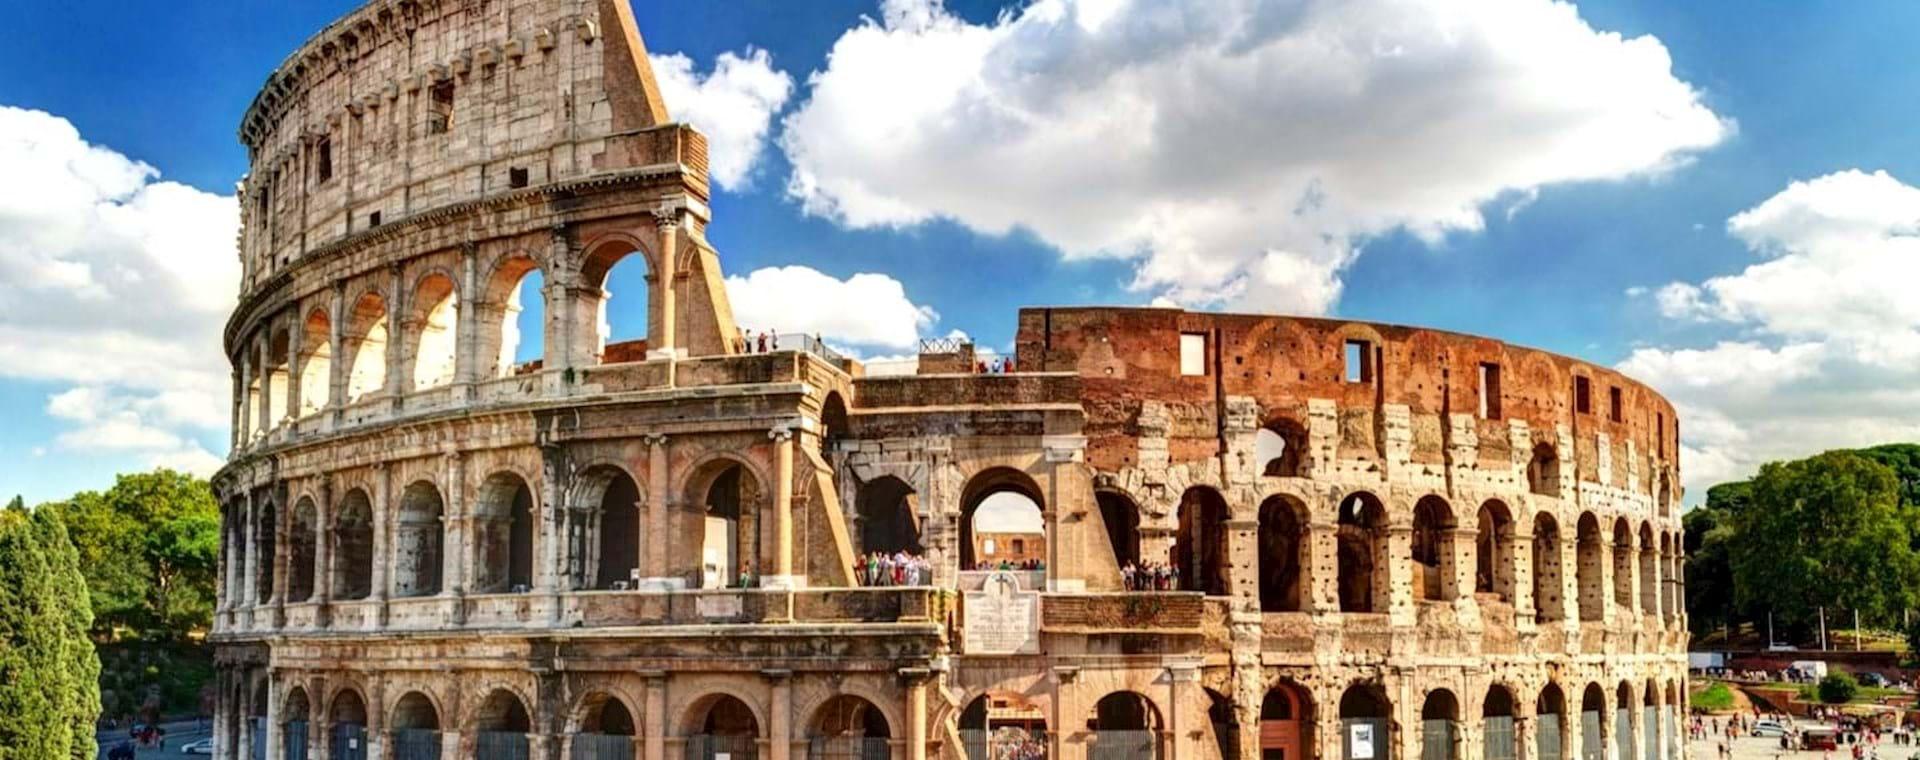 Full-Day Combo: Colosseum & Best of Rome Walking Tour